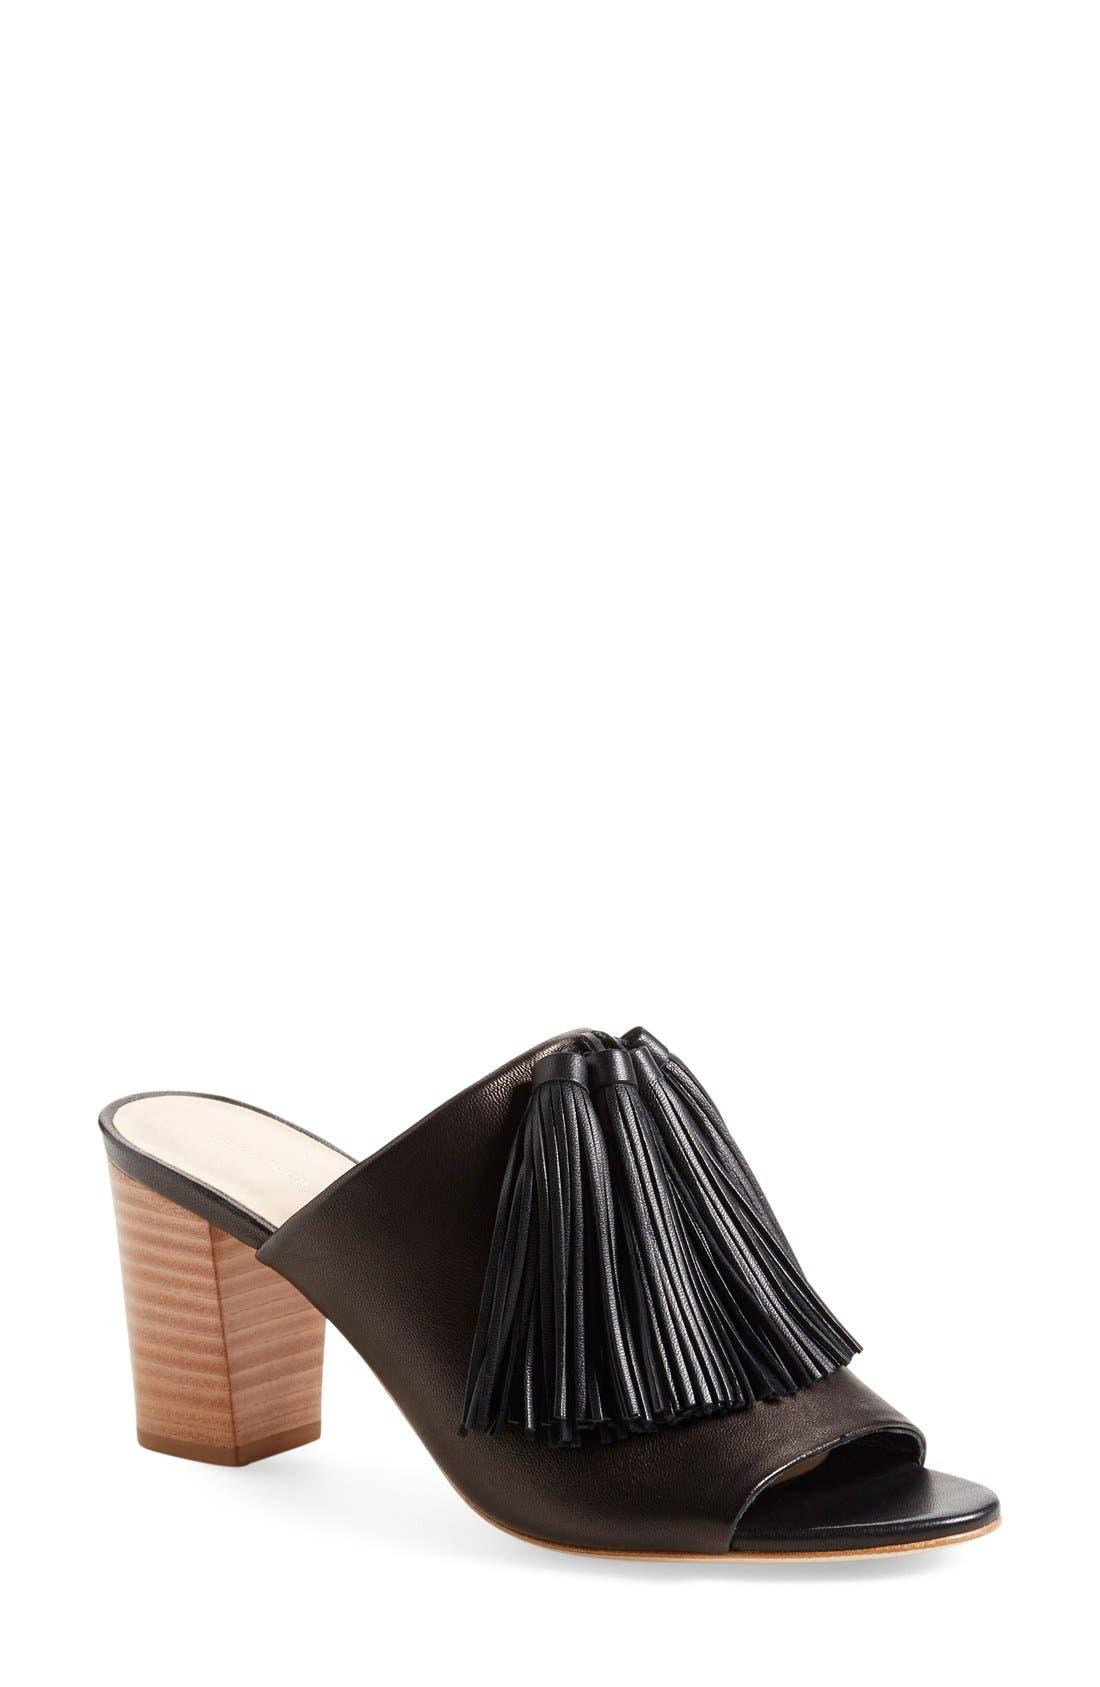 Loeffler Randall Clo Tassel Mule Sandal